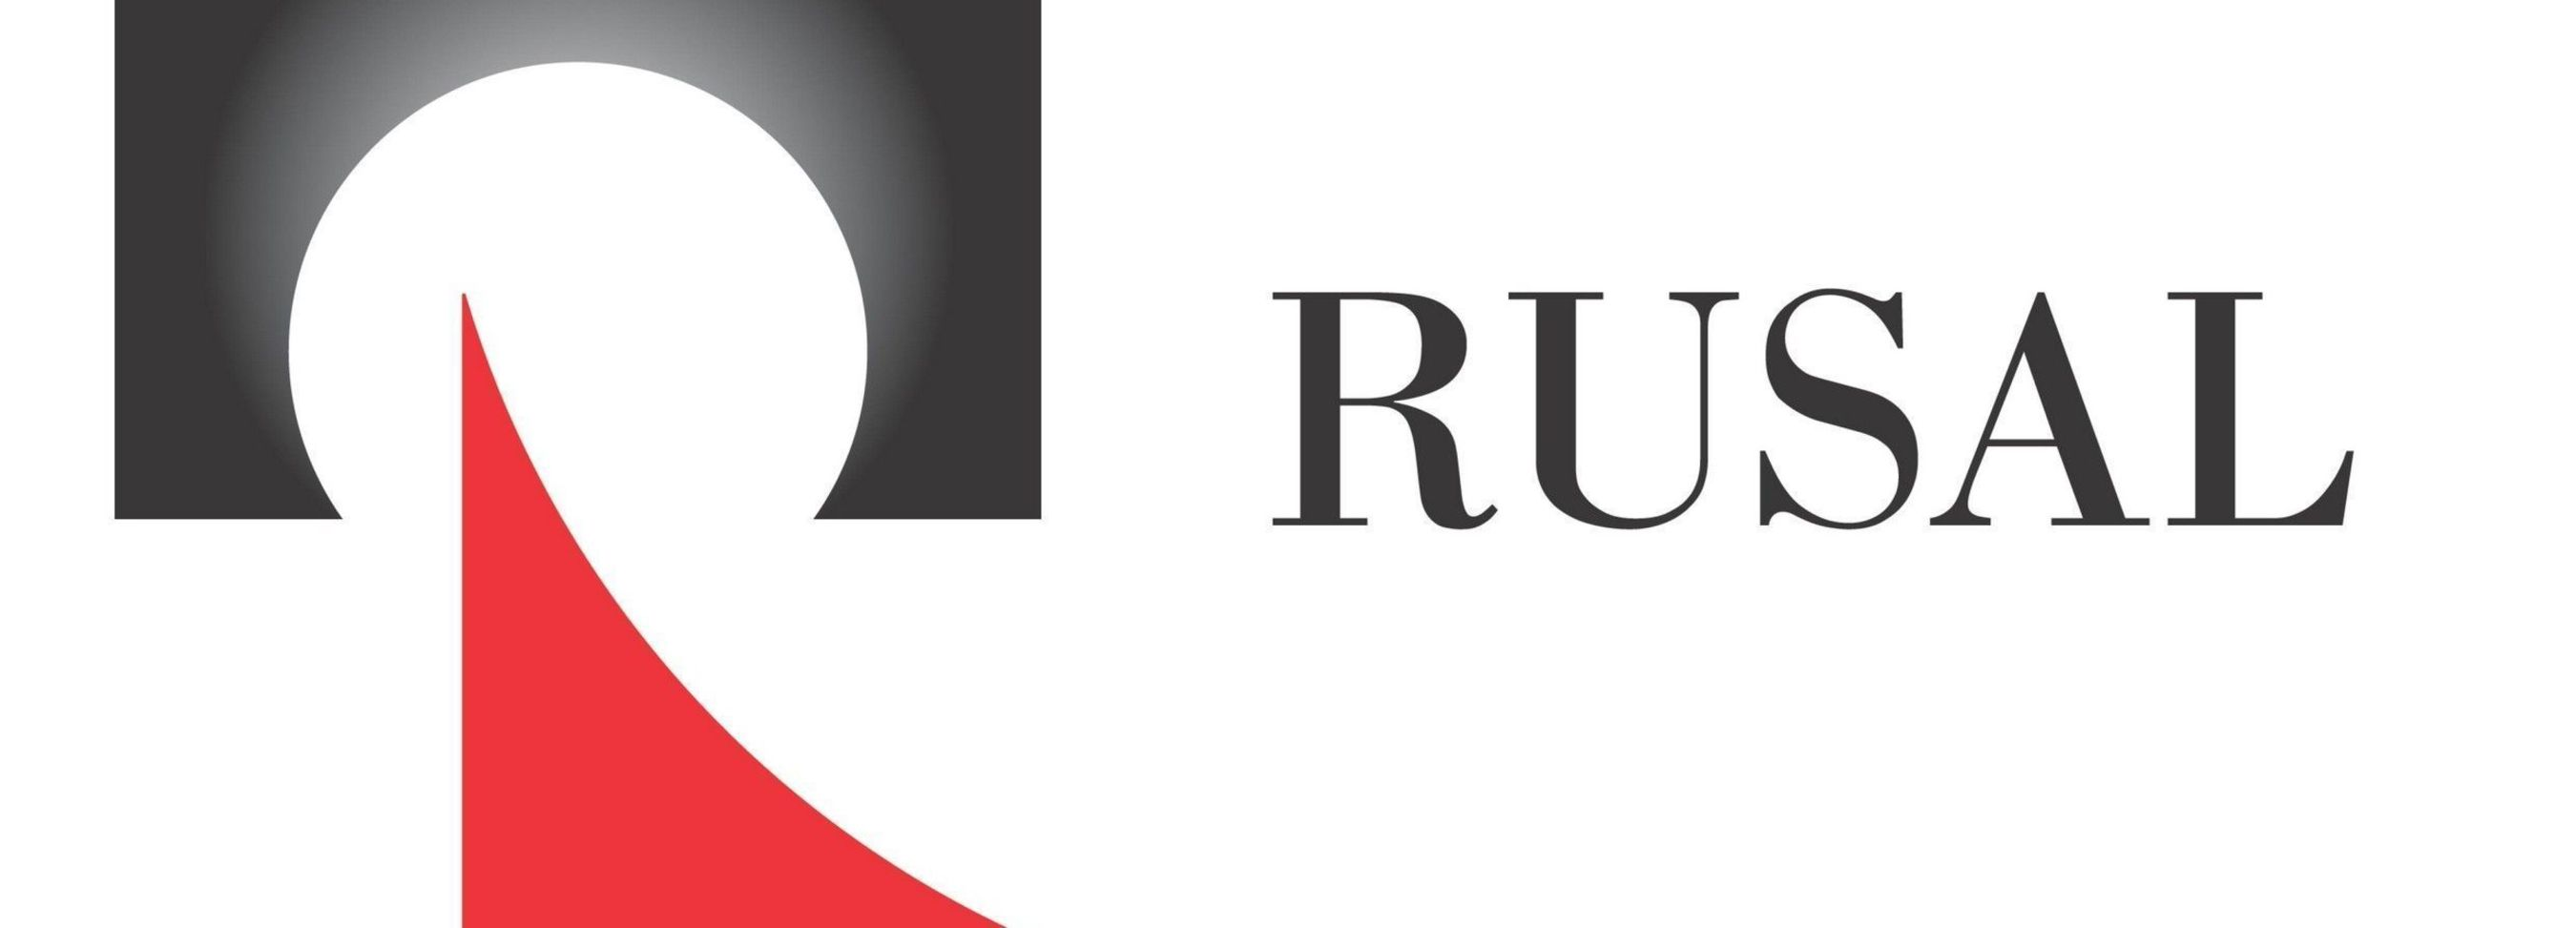 UC RUSAL Logo (PRNewsFoto/UC RUSAL)